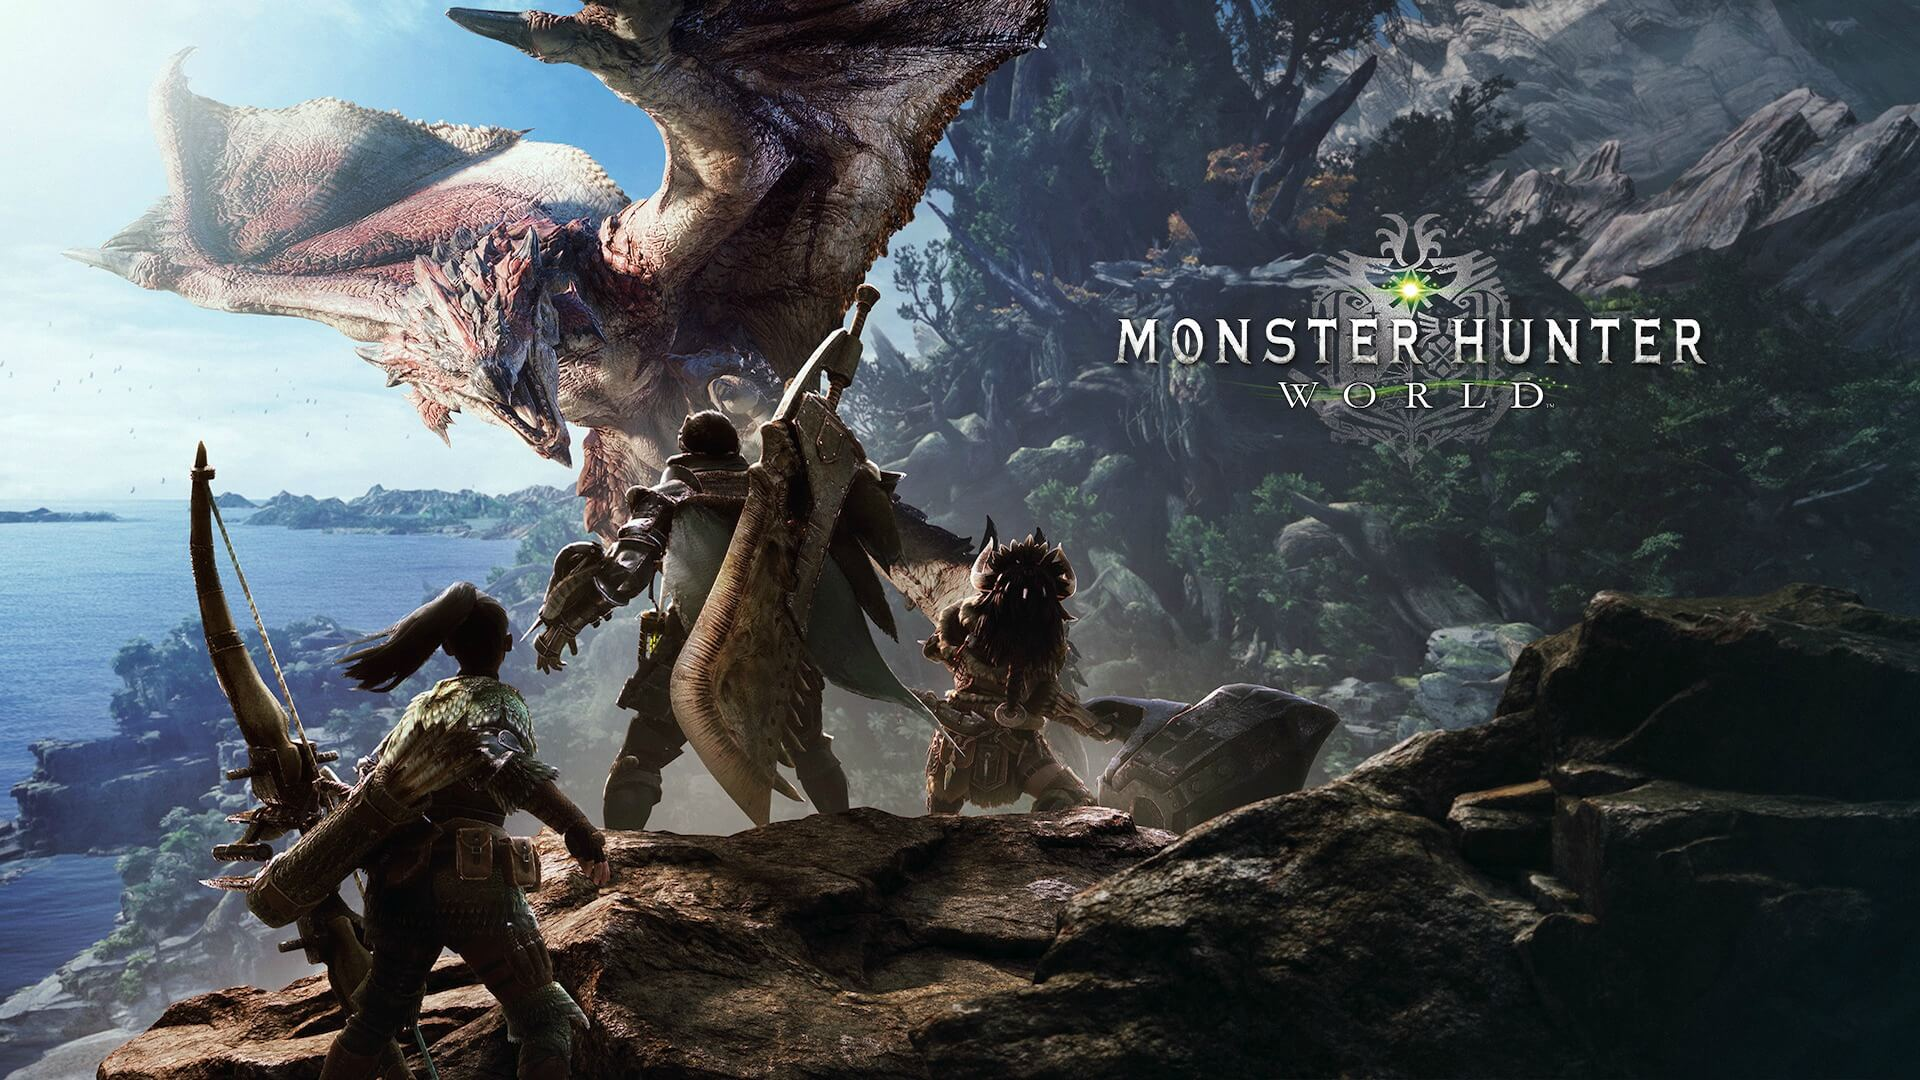 Monster Hunter: World Rilis di PC 9 Agustus, Ini Spesifikasinya